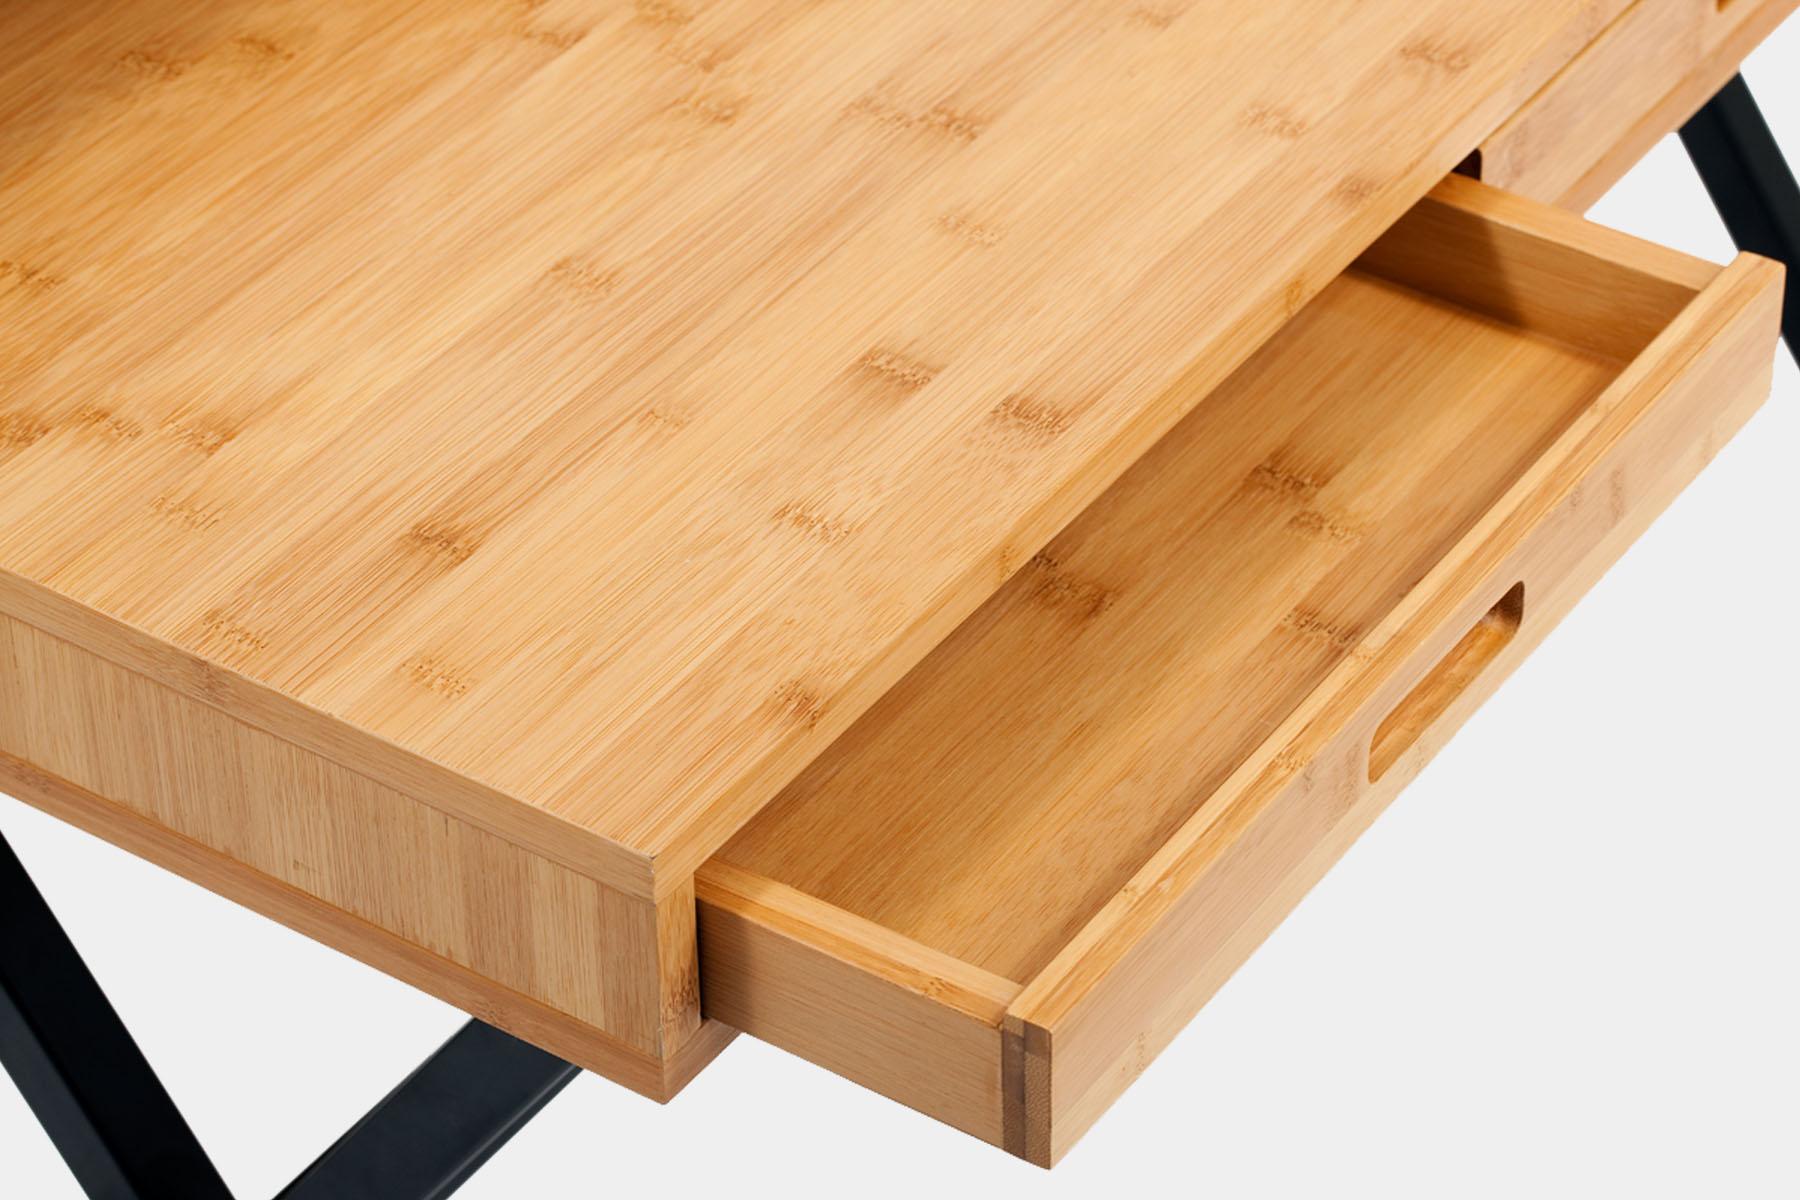 bureau hyppolite 1 florence watine architecture design. Black Bedroom Furniture Sets. Home Design Ideas